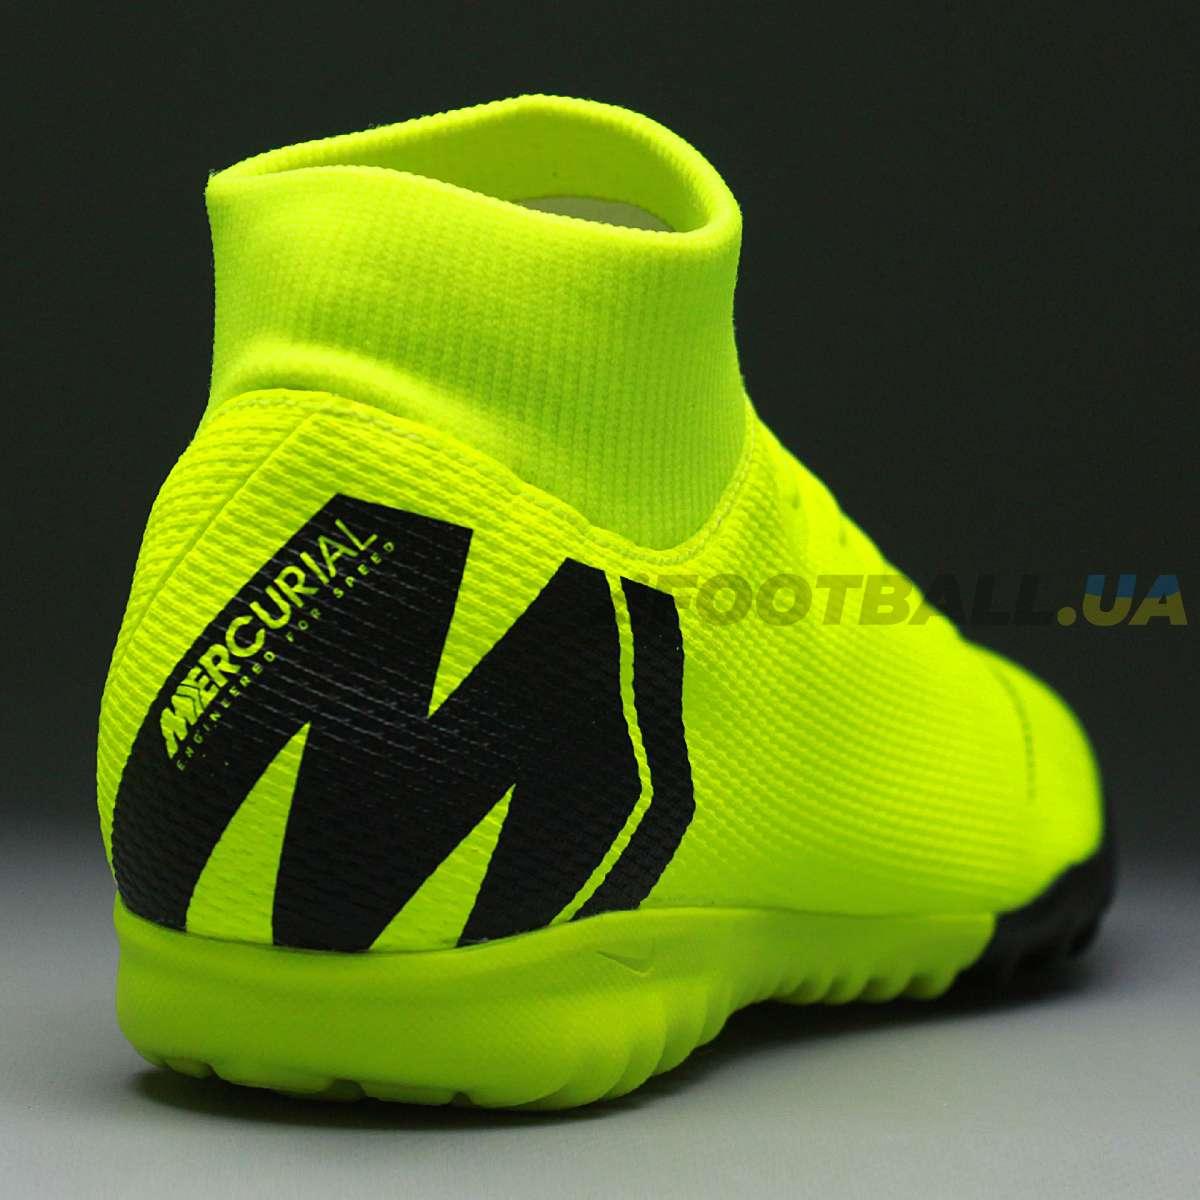 ... Сороконожки Nike Mercurial Superfly Academy AH7370-701 9 ... fa1f4dc57f5d2